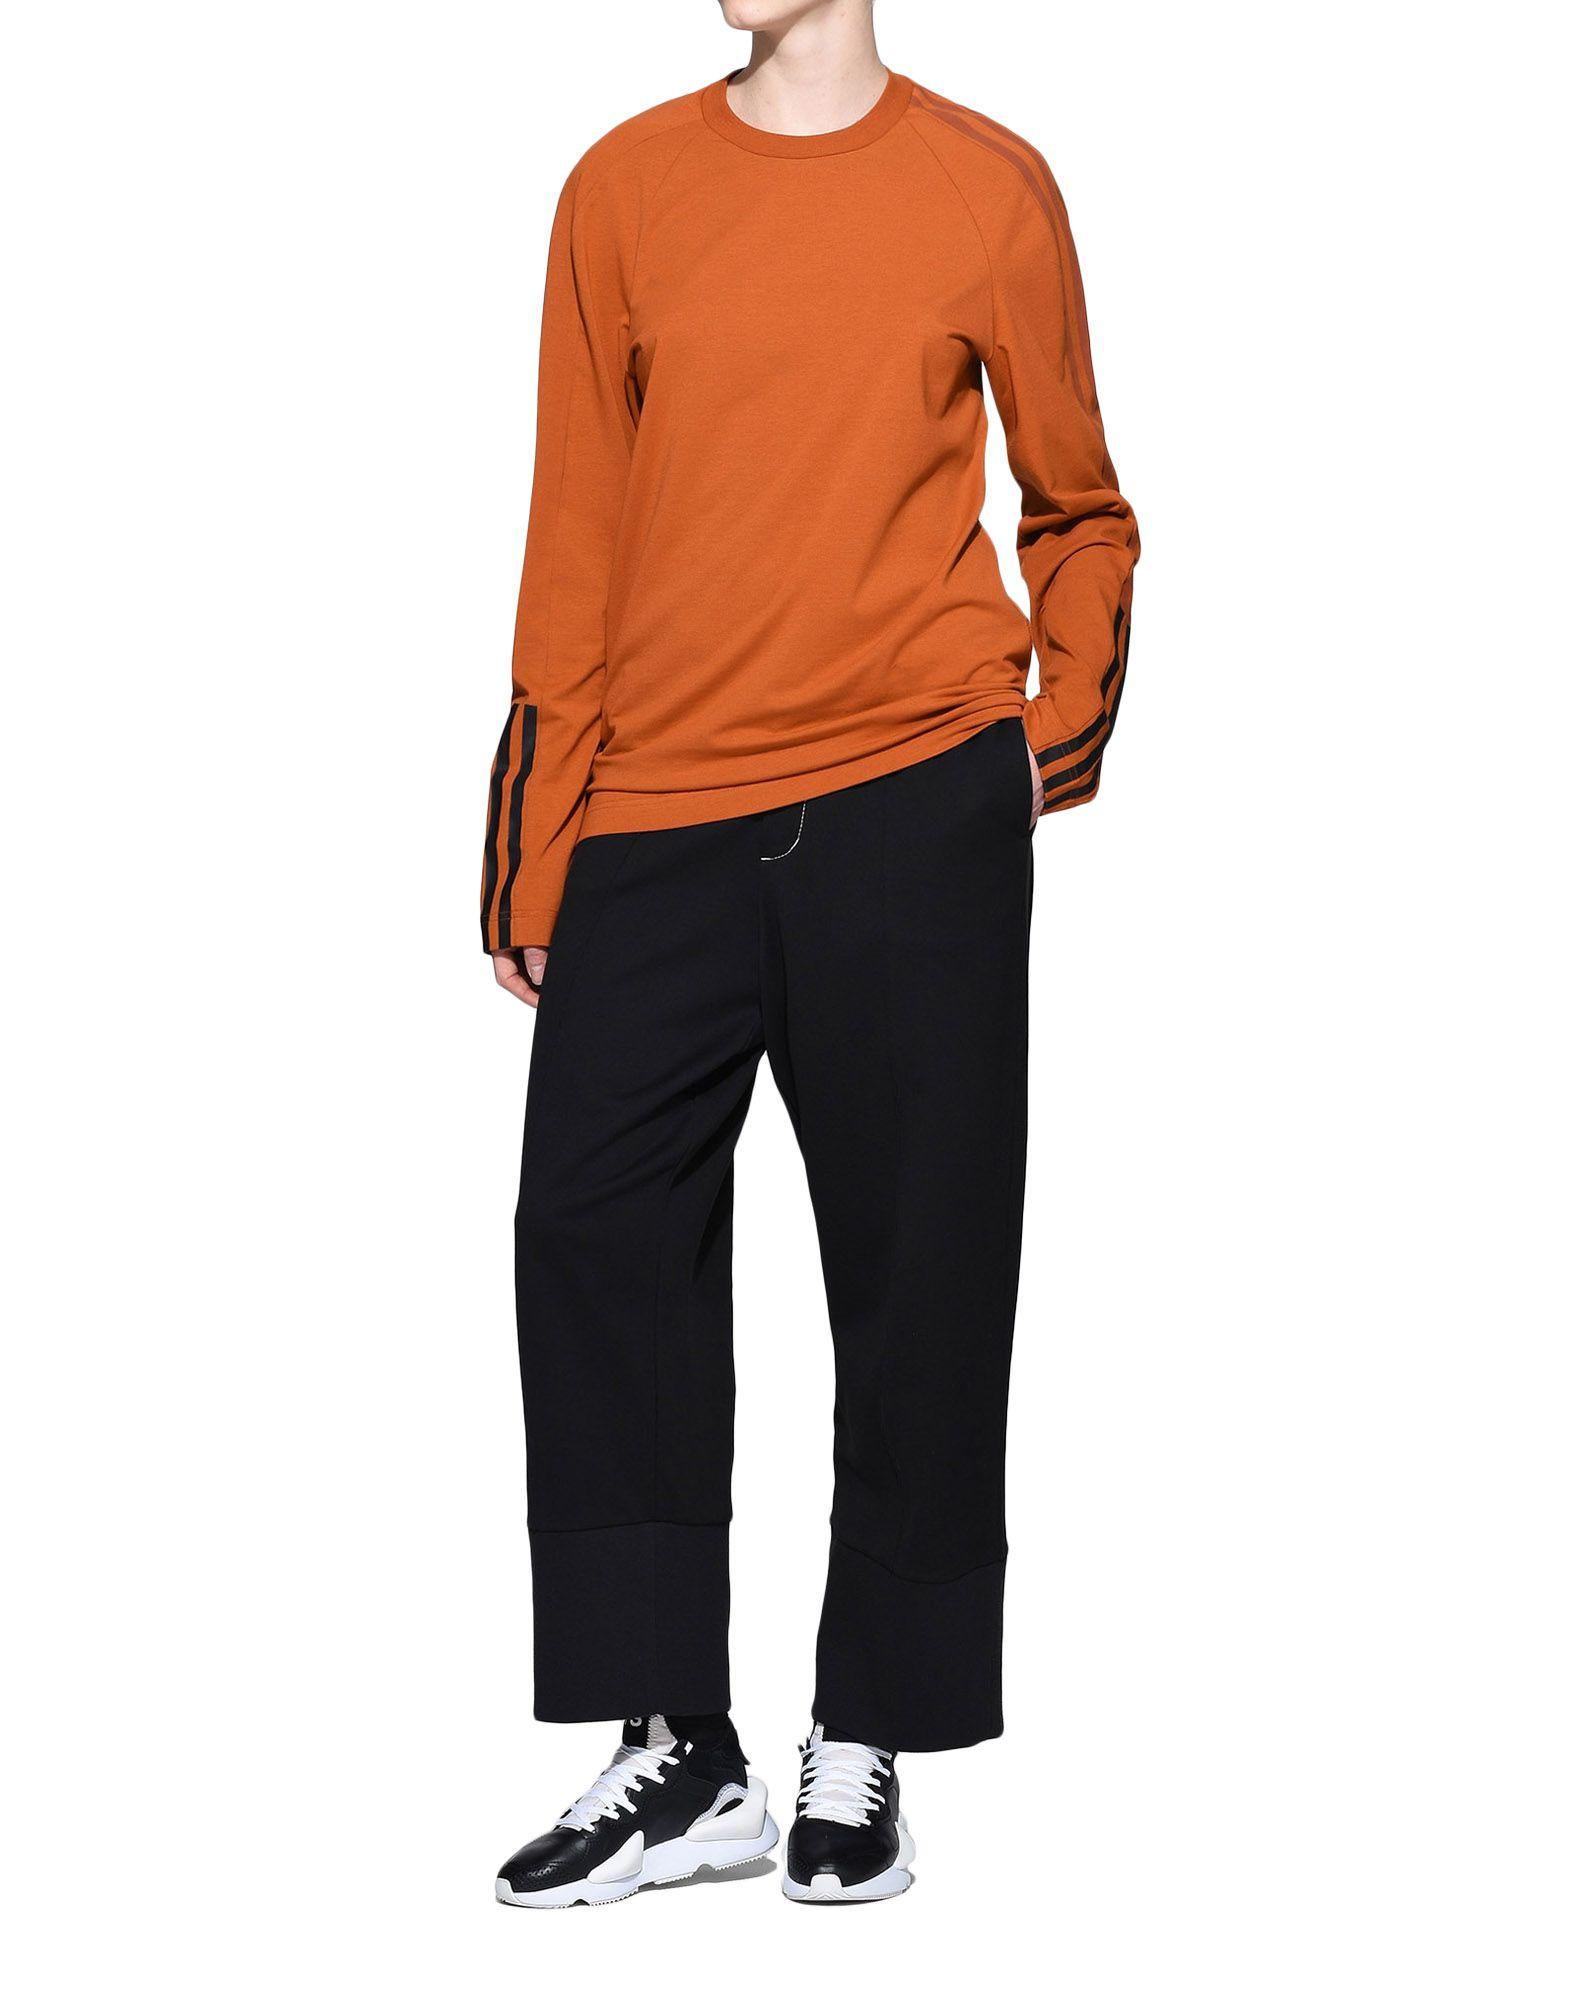 Y-3 Y-3 3-Stripes Tee Long sleeve t-shirt Woman a